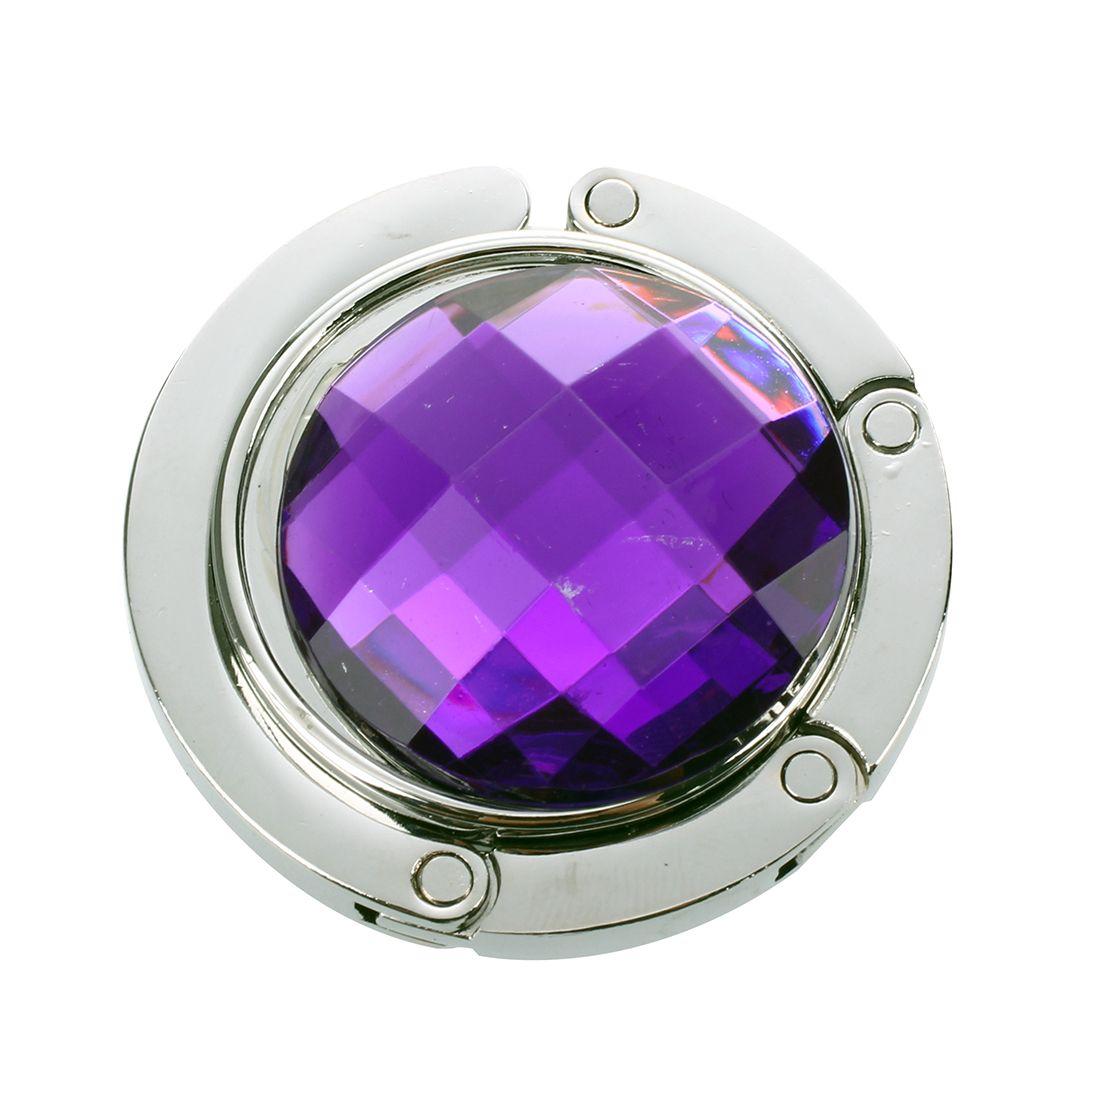 $1.17 (Buy here: https://alitems.com/g/1e8d114494ebda23ff8b16525dc3e8/?i=5&ulp=https%3A%2F%2Fwww.aliexpress.com%2Fitem%2FHangers-Alloy-Rhinestone-Glass-Folding-Bag-hook%2F32793291210.html ) Hangers Alloy Rhinestone Glass Folding Bag hook for just $1.17